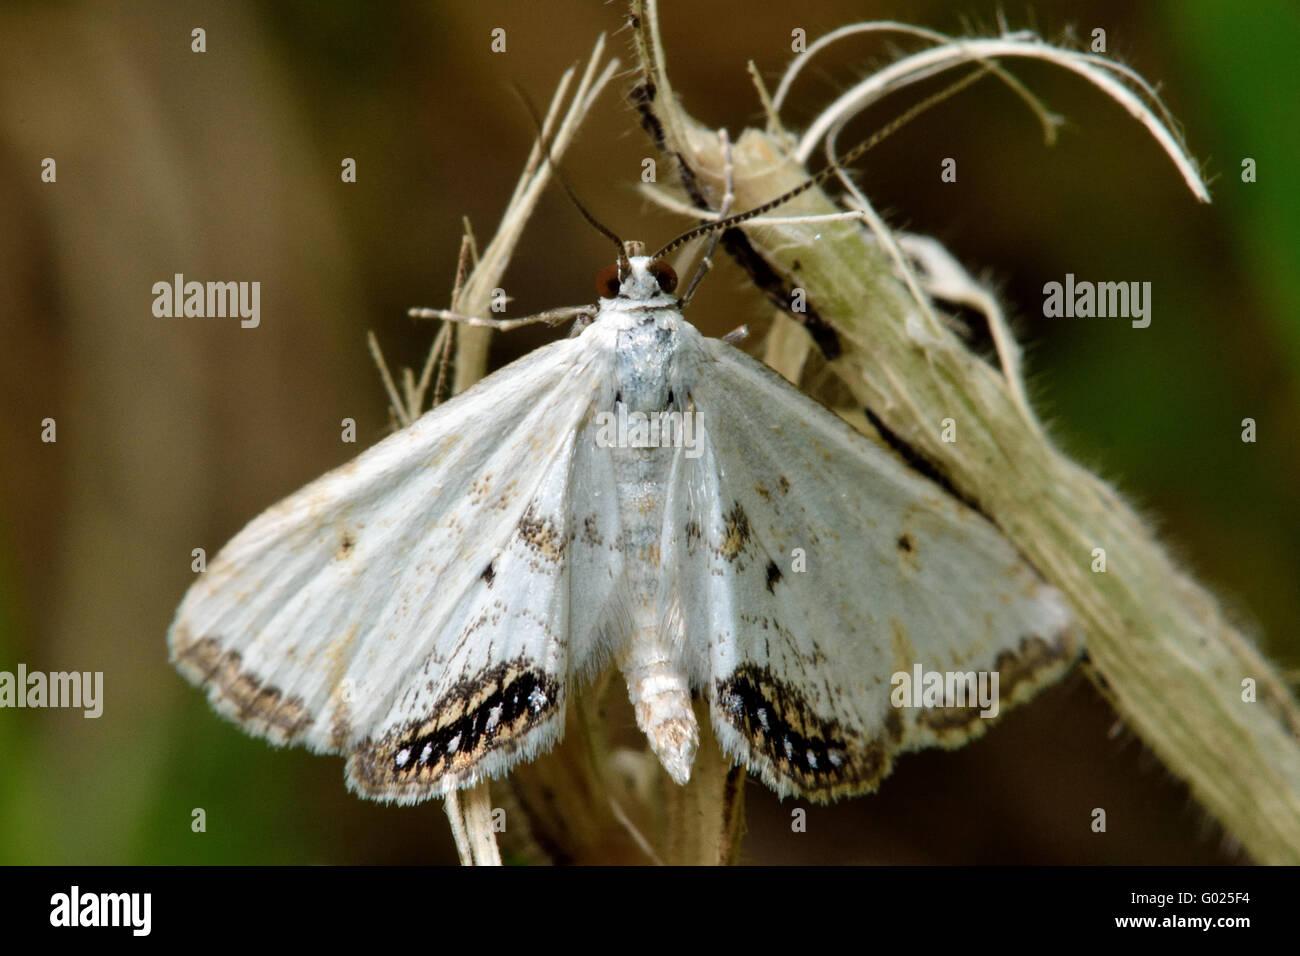 small white moth stockfotos small white moth bilder alamy. Black Bedroom Furniture Sets. Home Design Ideas